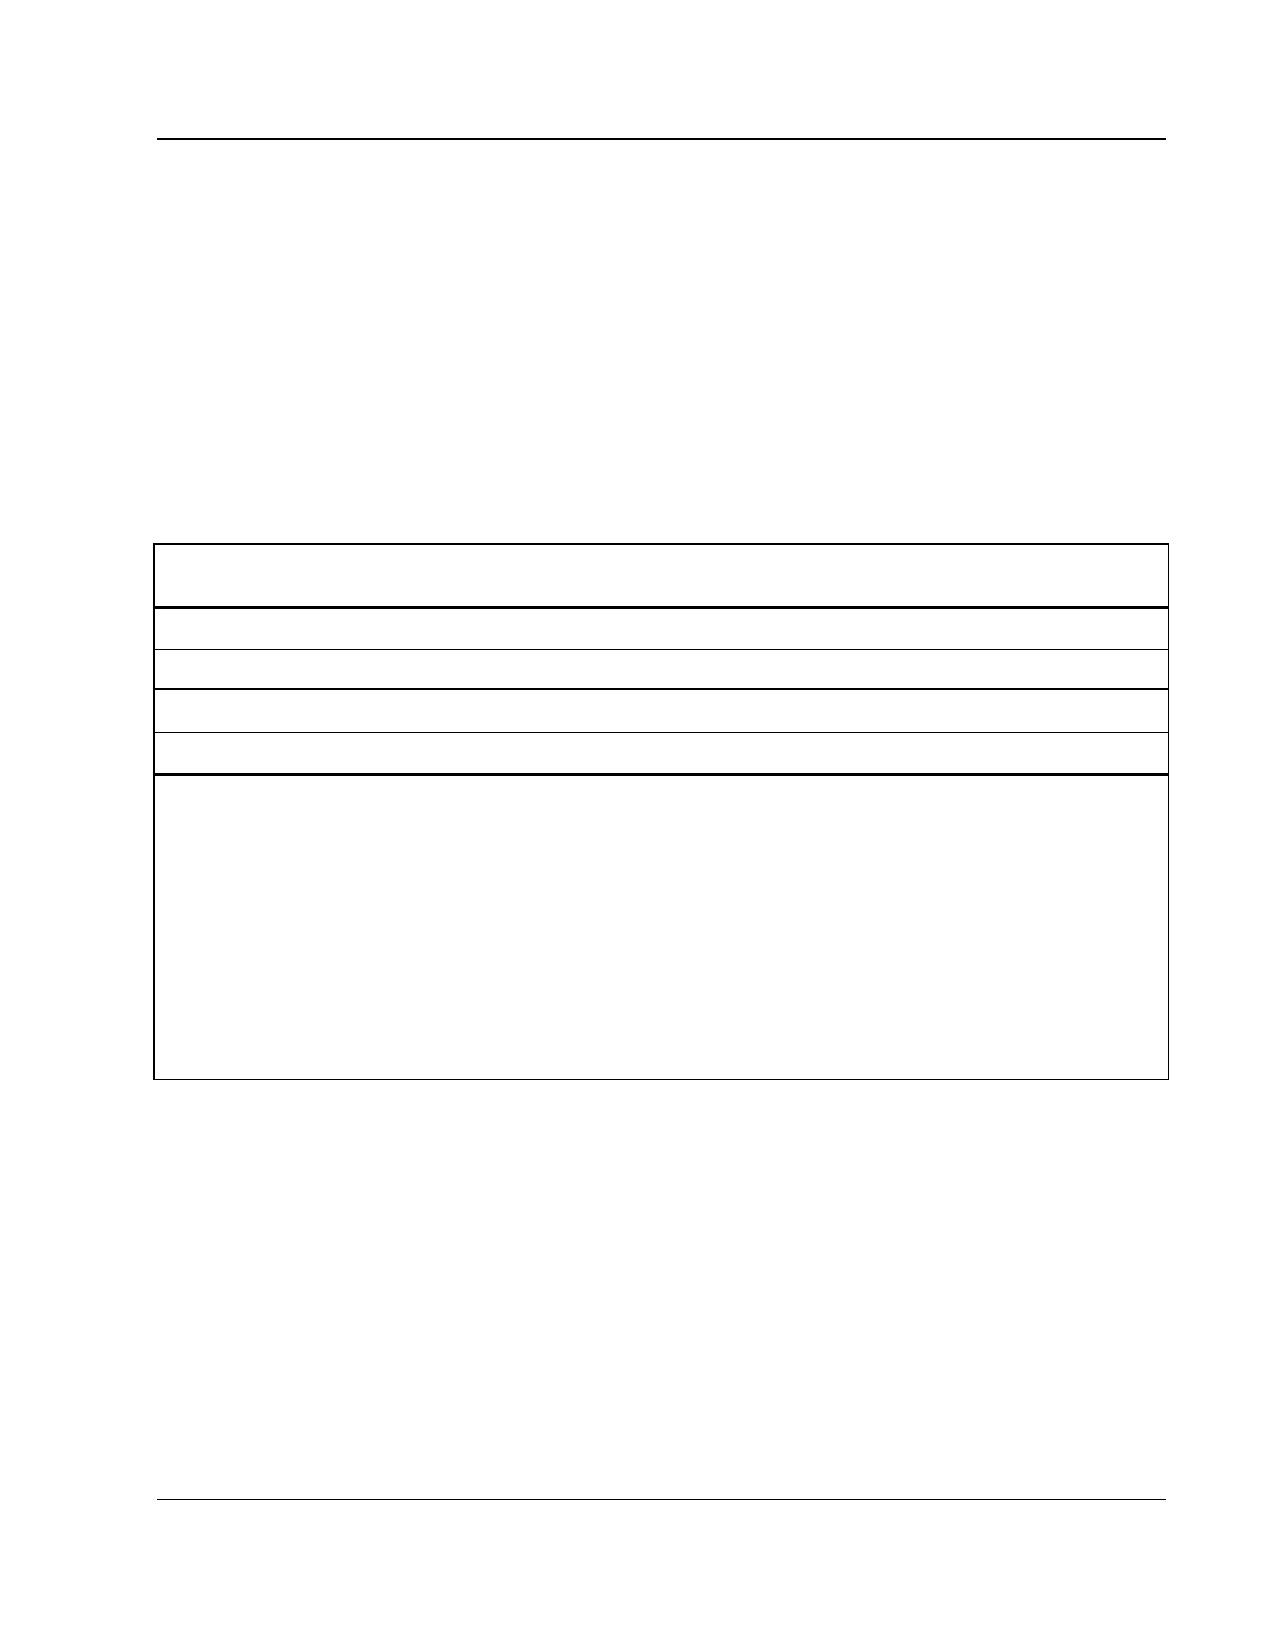 1N951 Datenblatt PDF